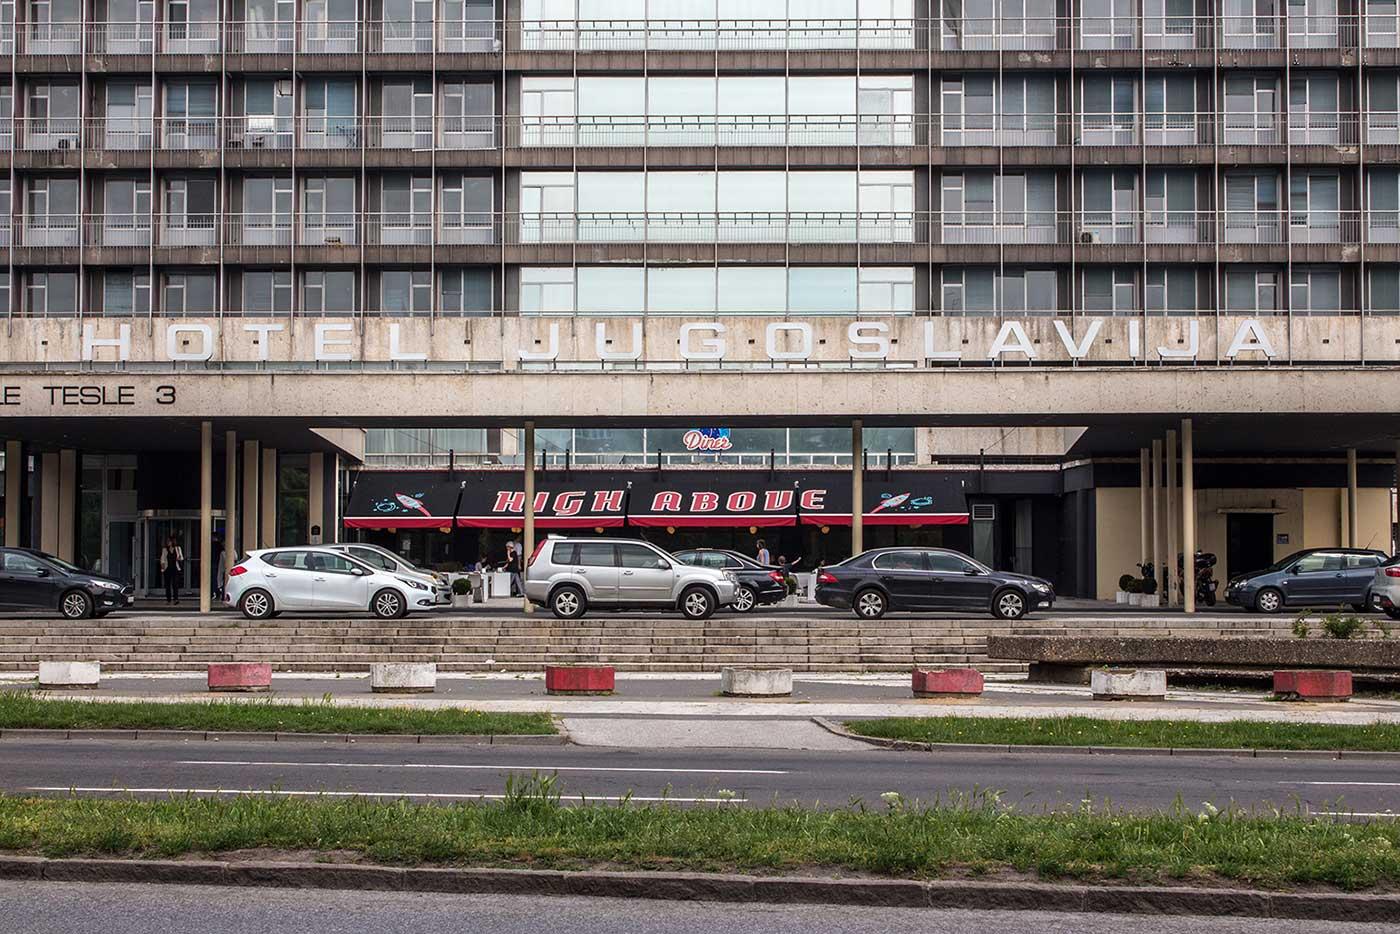 Hotel Jugoslavija, Novi Beograd (Mladen Kauzlarić, Lavoslav Horvat & Kazimir Ostrogović, 1961-1967).